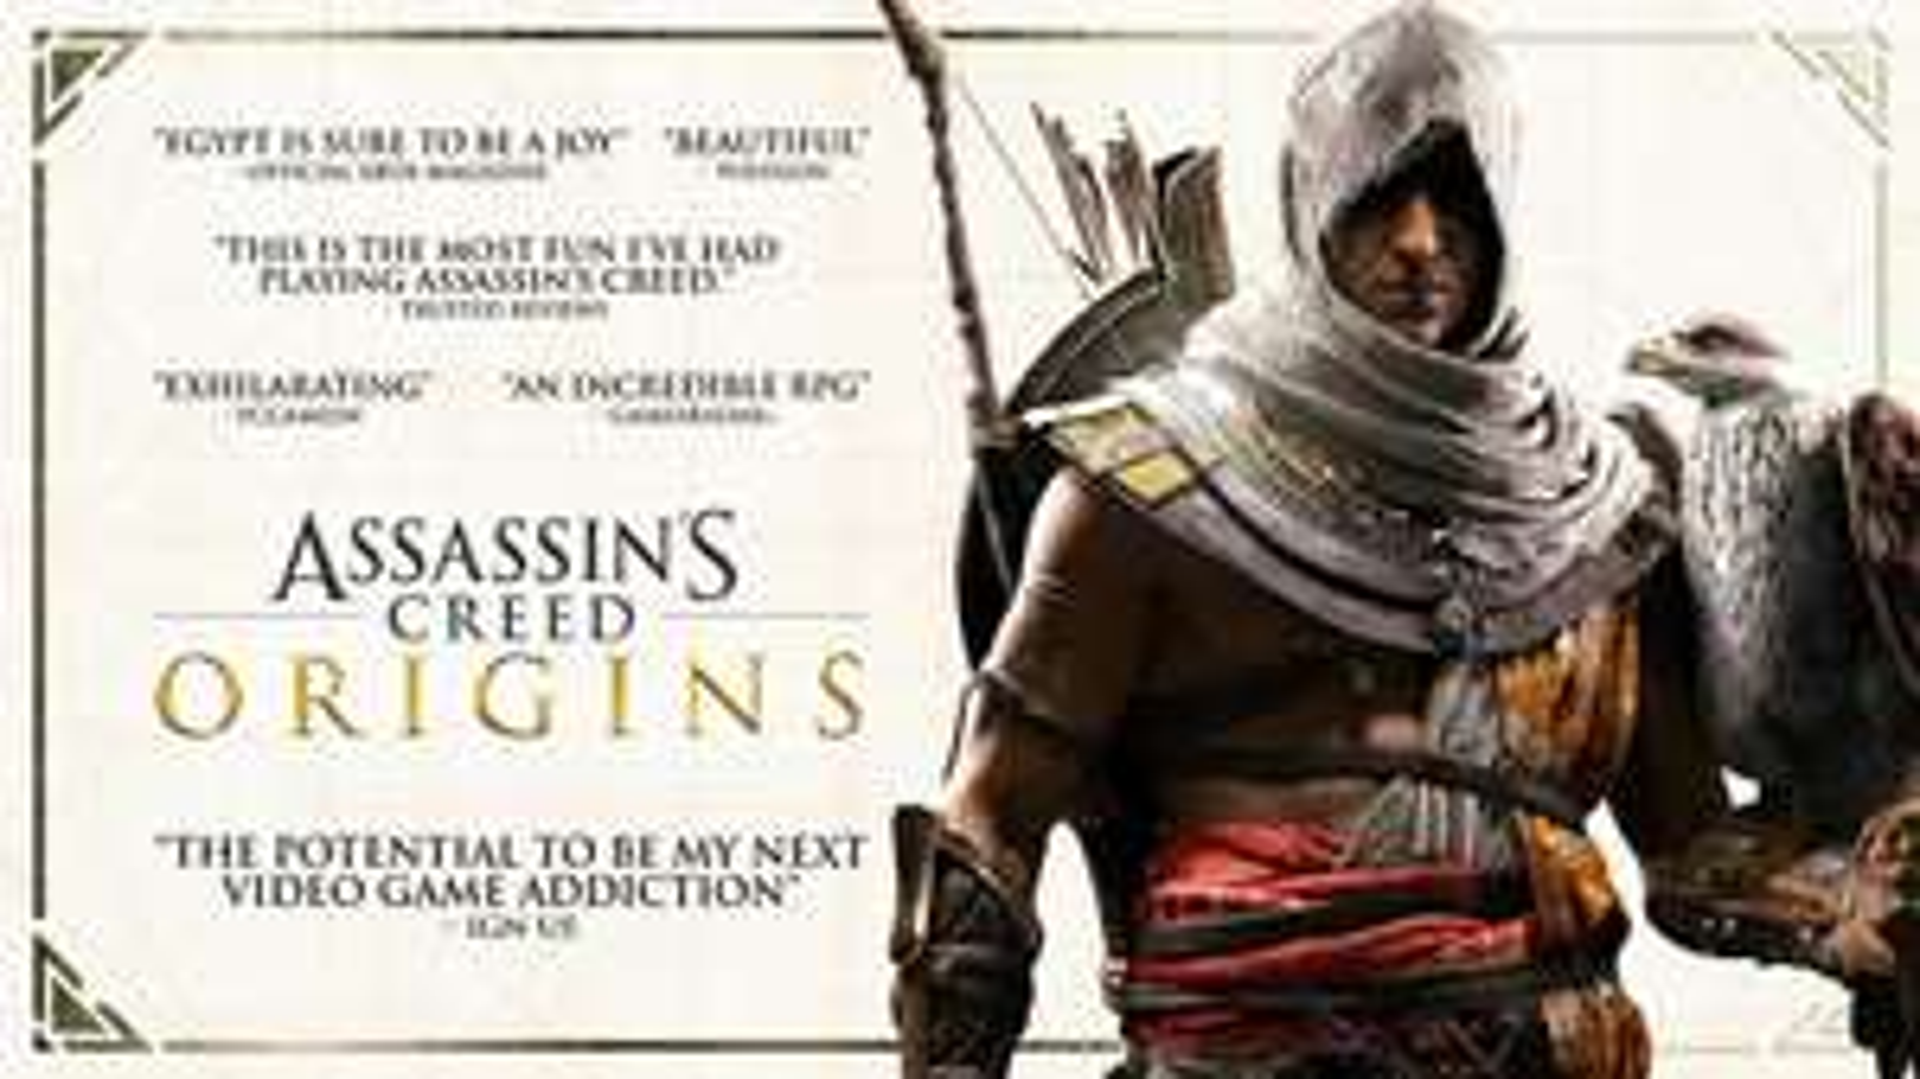 Assassin's Creed Origins (PC) voor 4,99 via EPIC GAMES